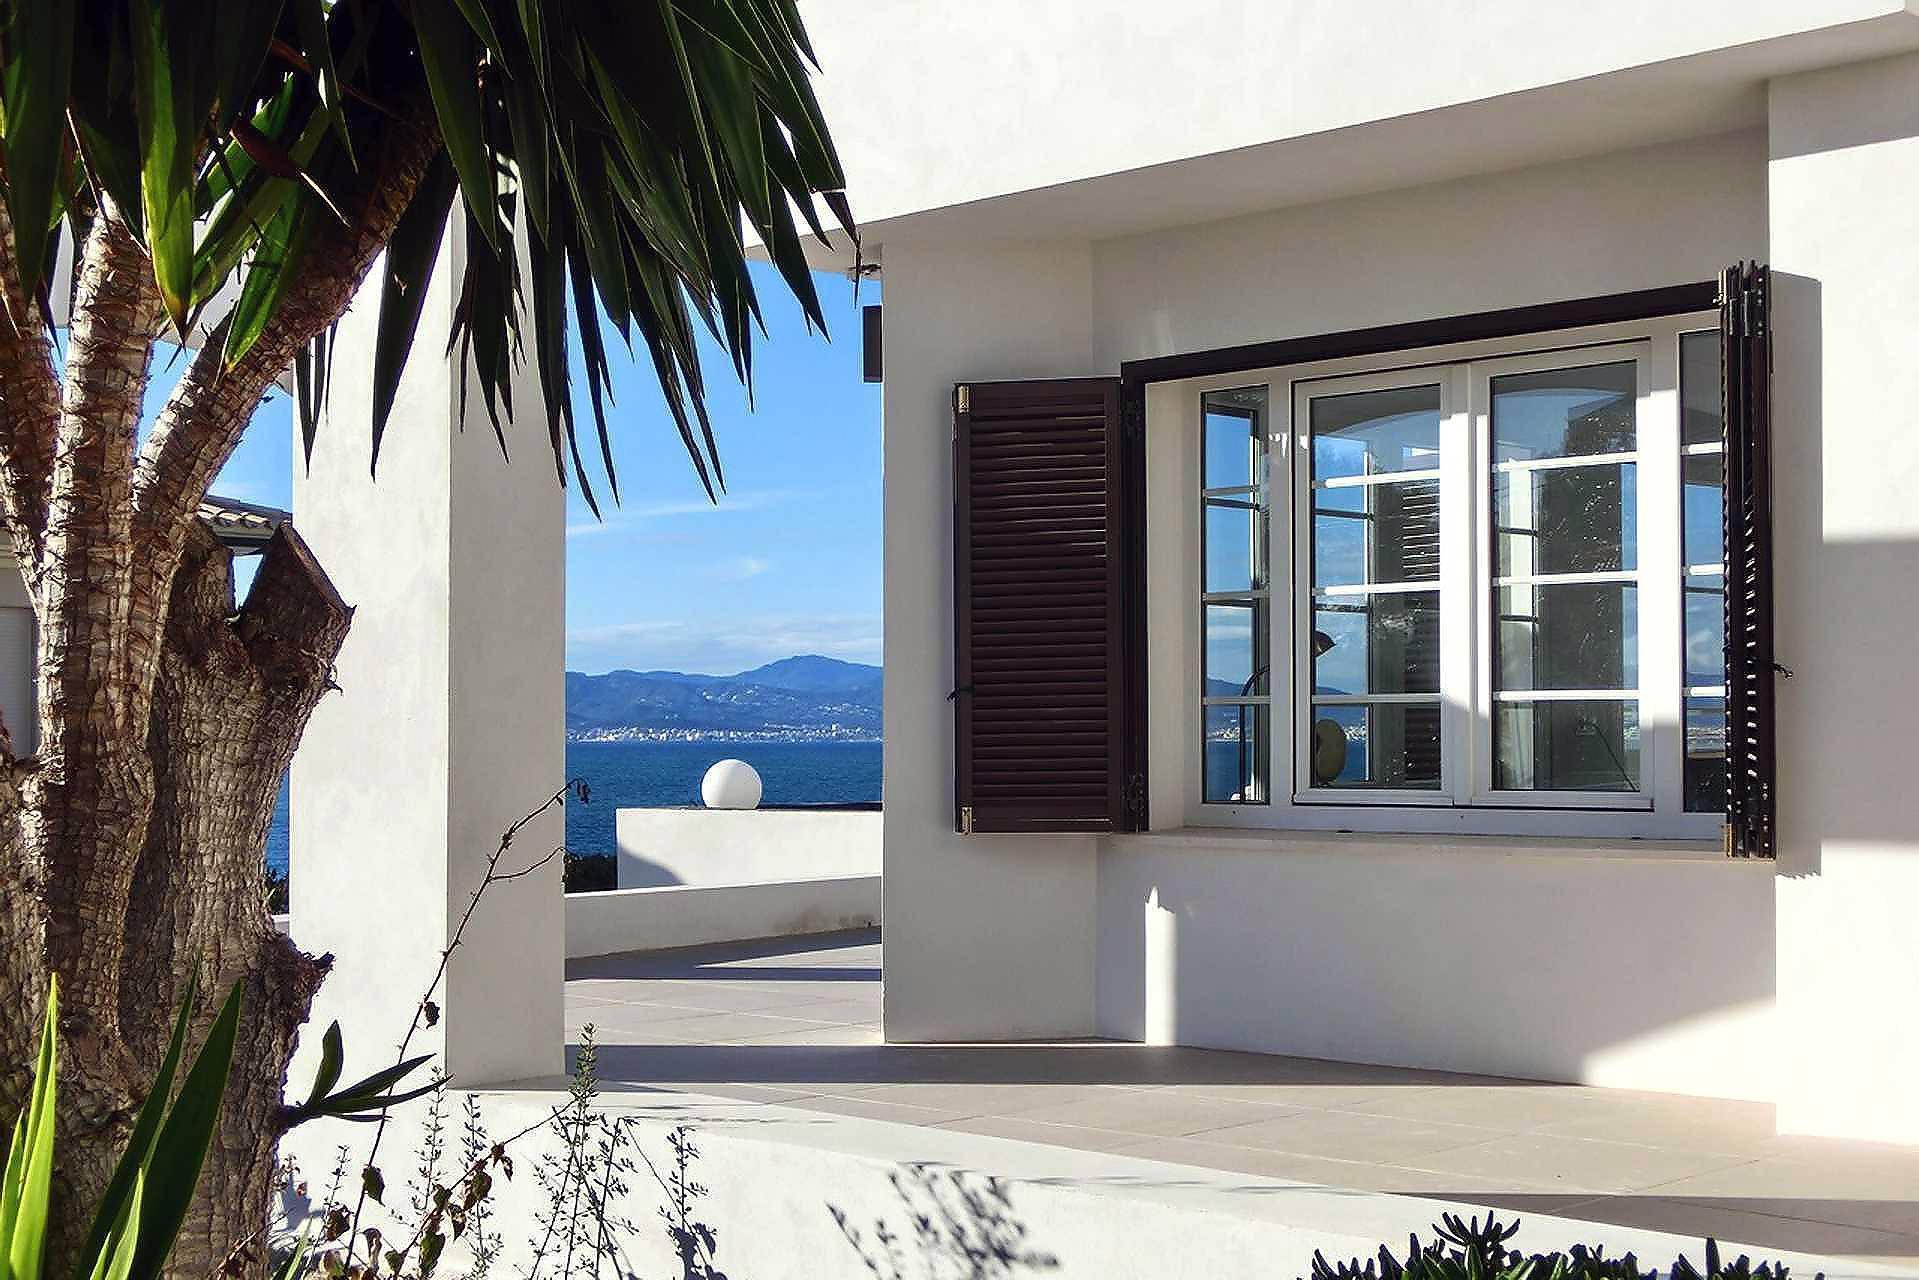 01-95 Ferienhaus Mallorca Süden mit Meerblick Bild 5